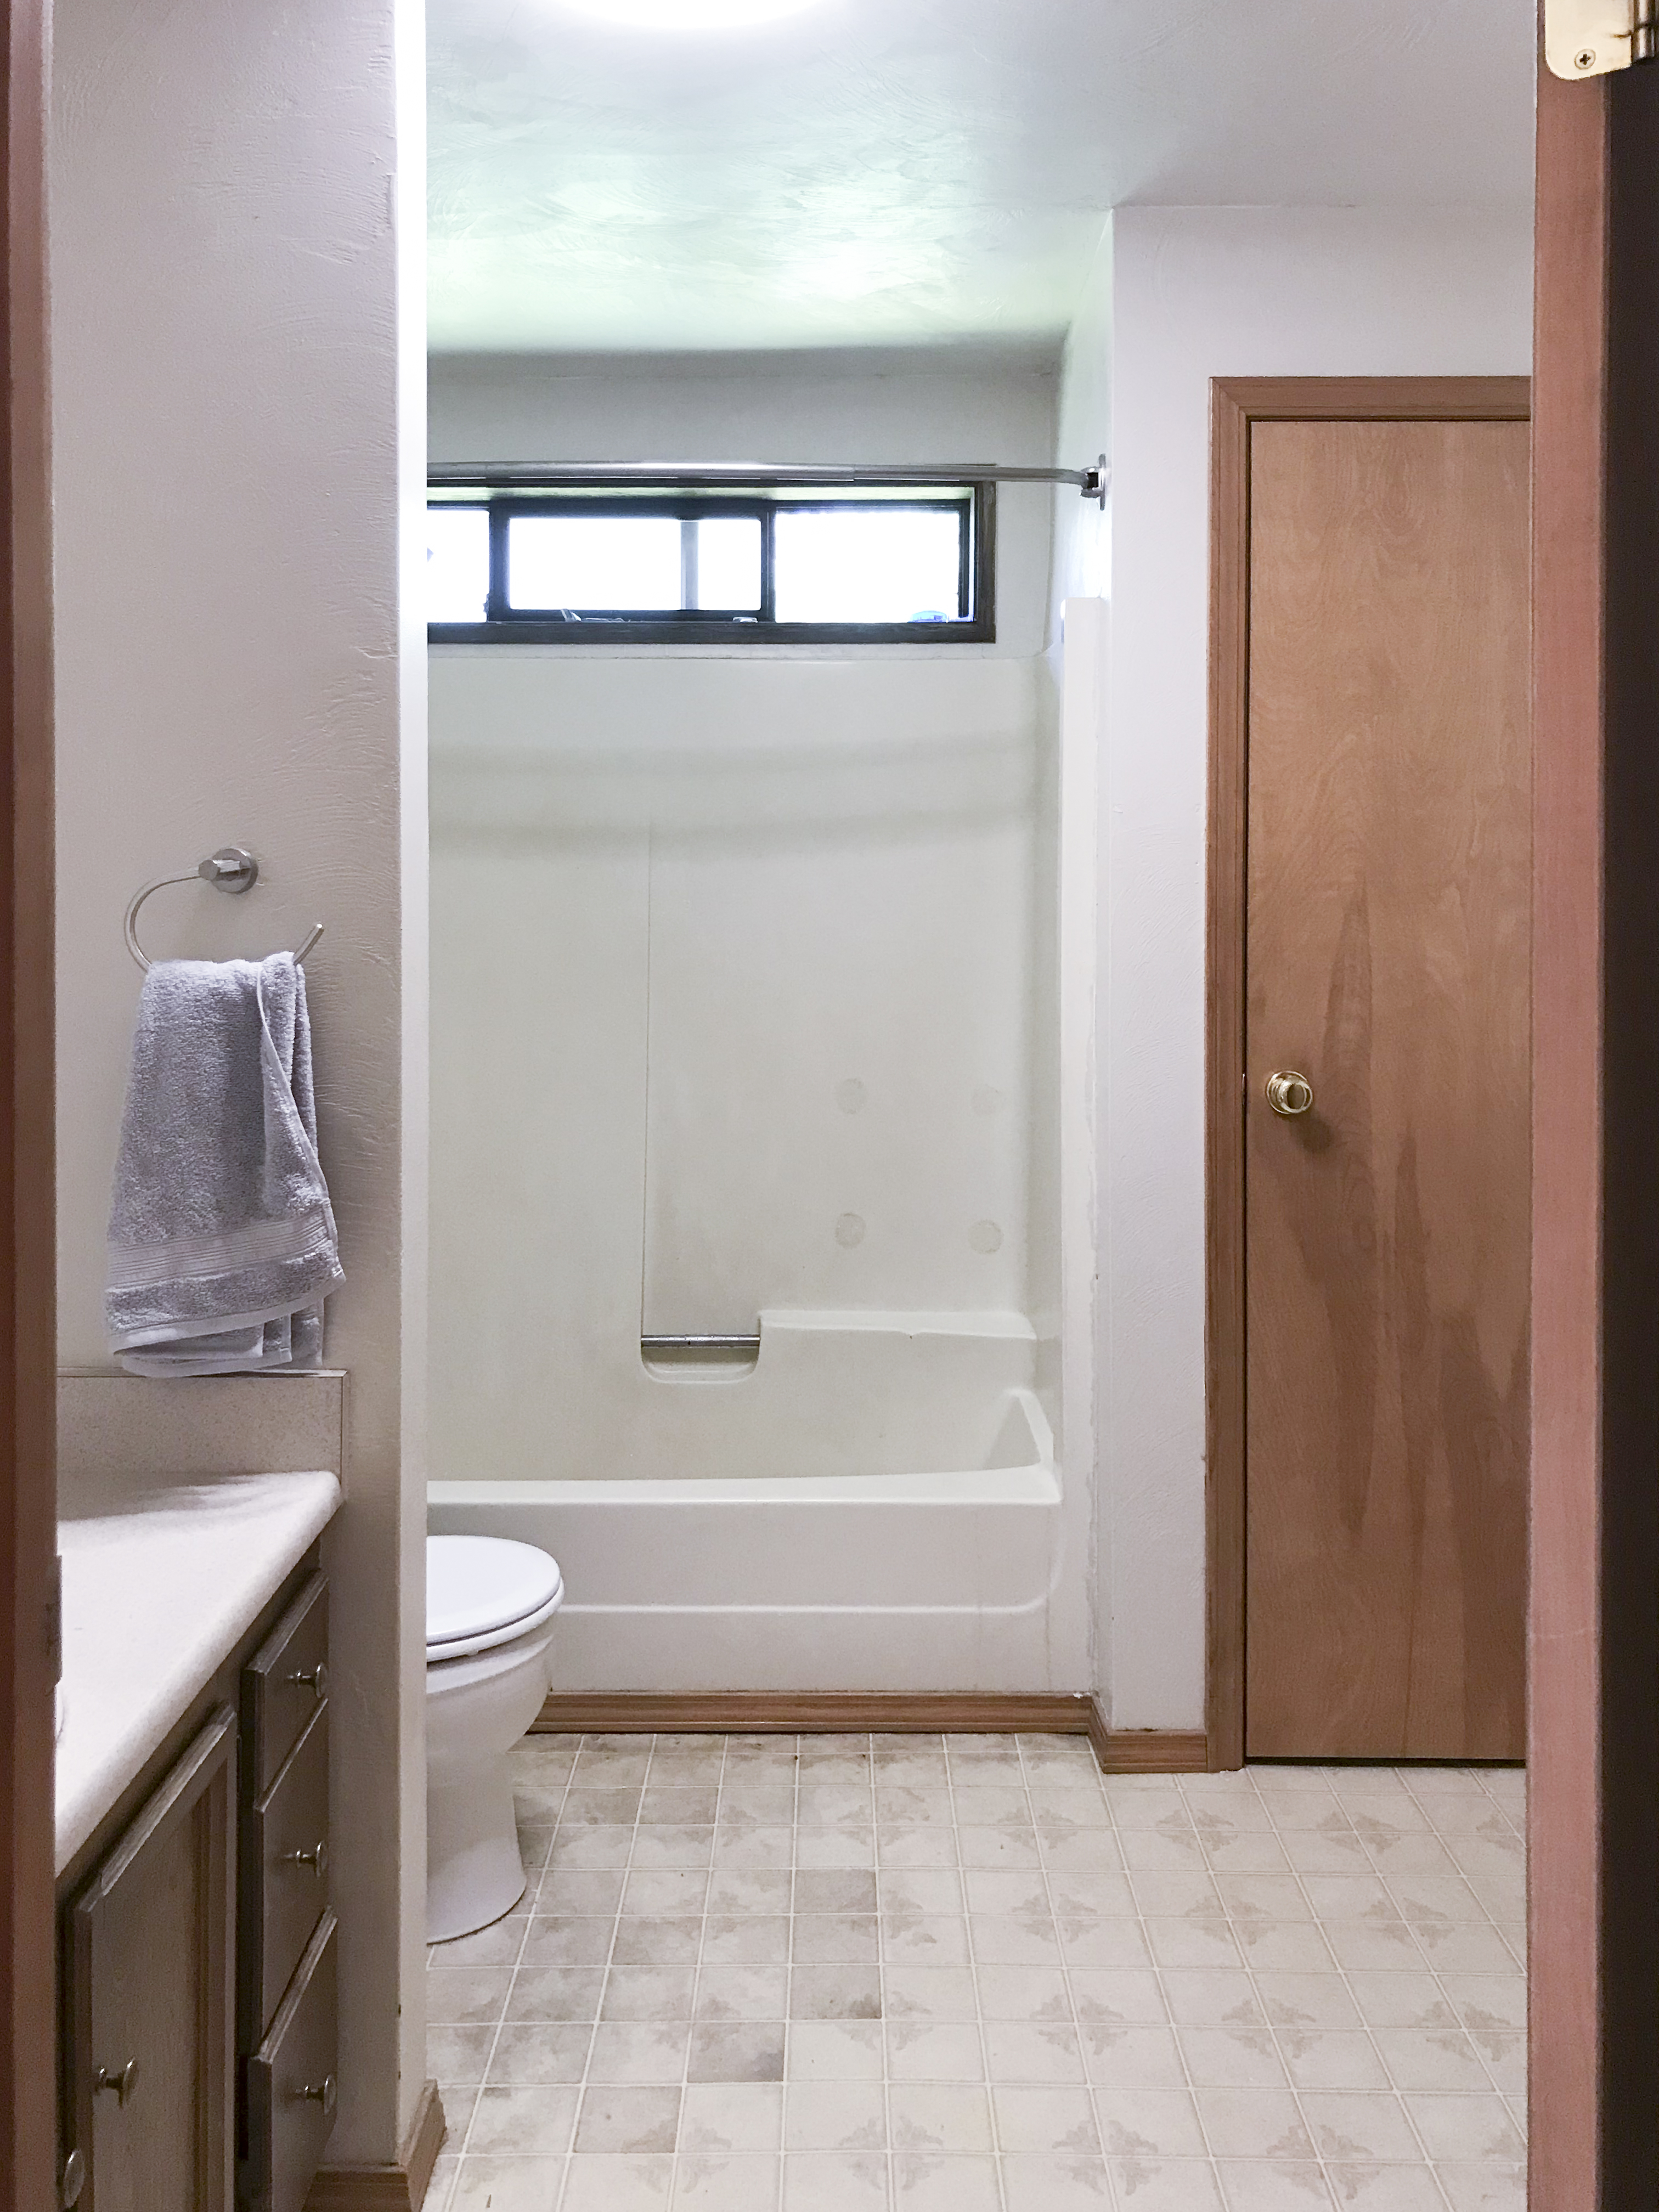 Alaskan Bathroom Makeover Reveal - Shades of Blue Interiors